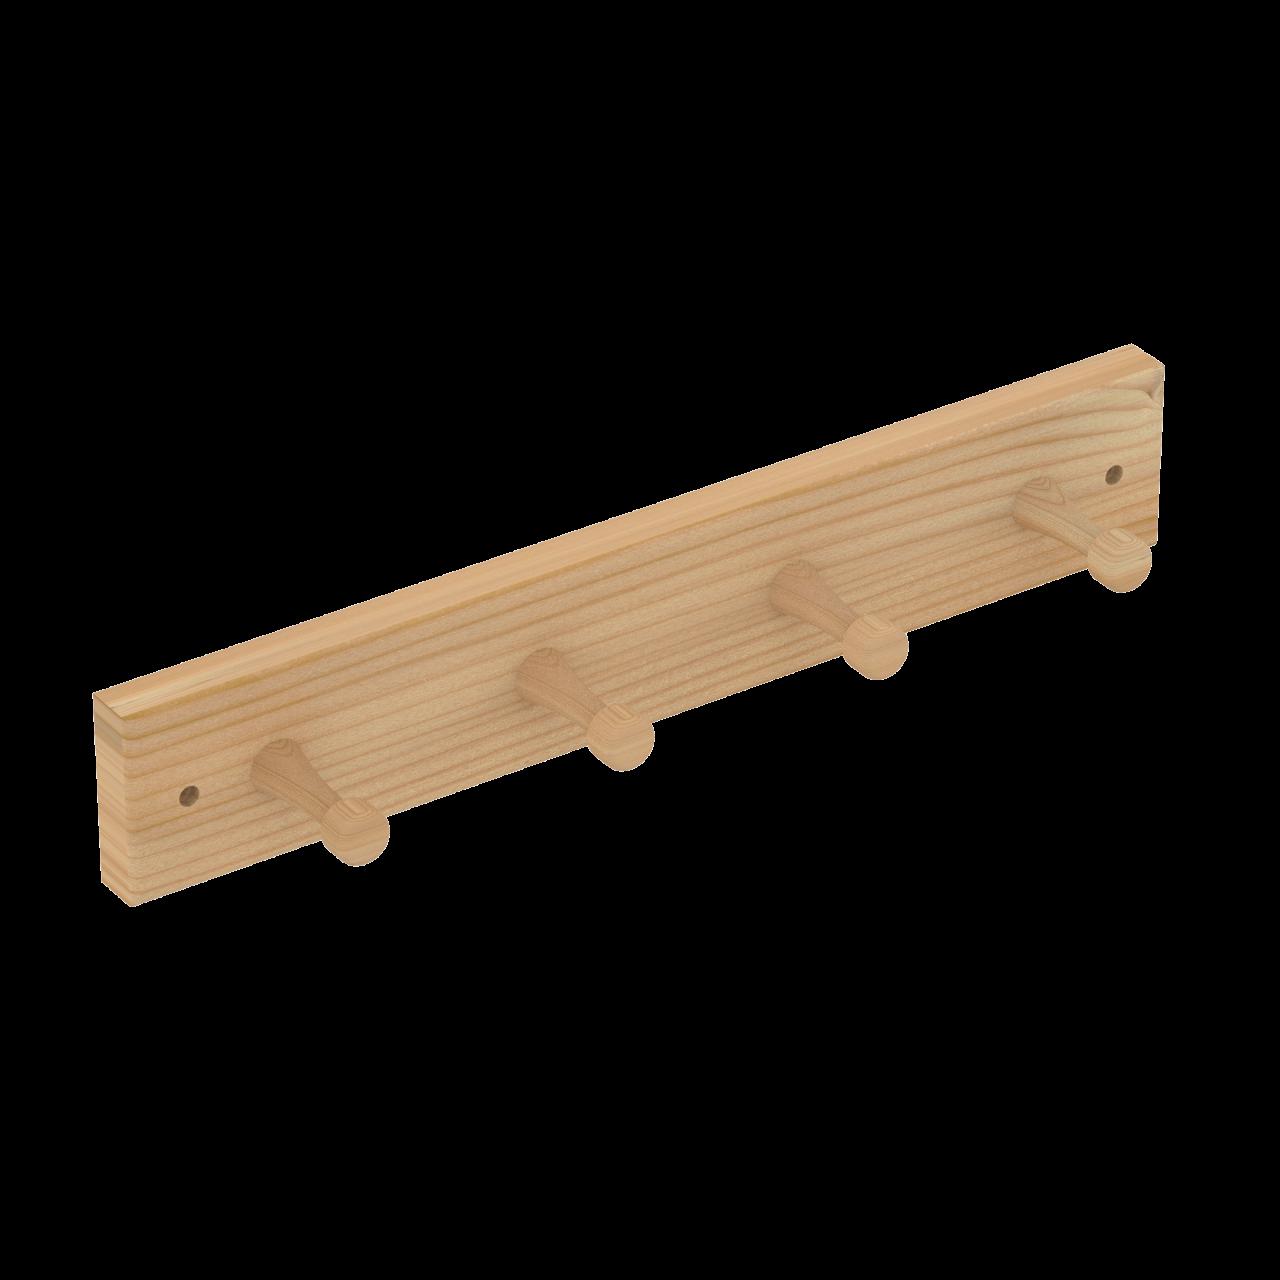 Sawo kapstok 4-haaks pine